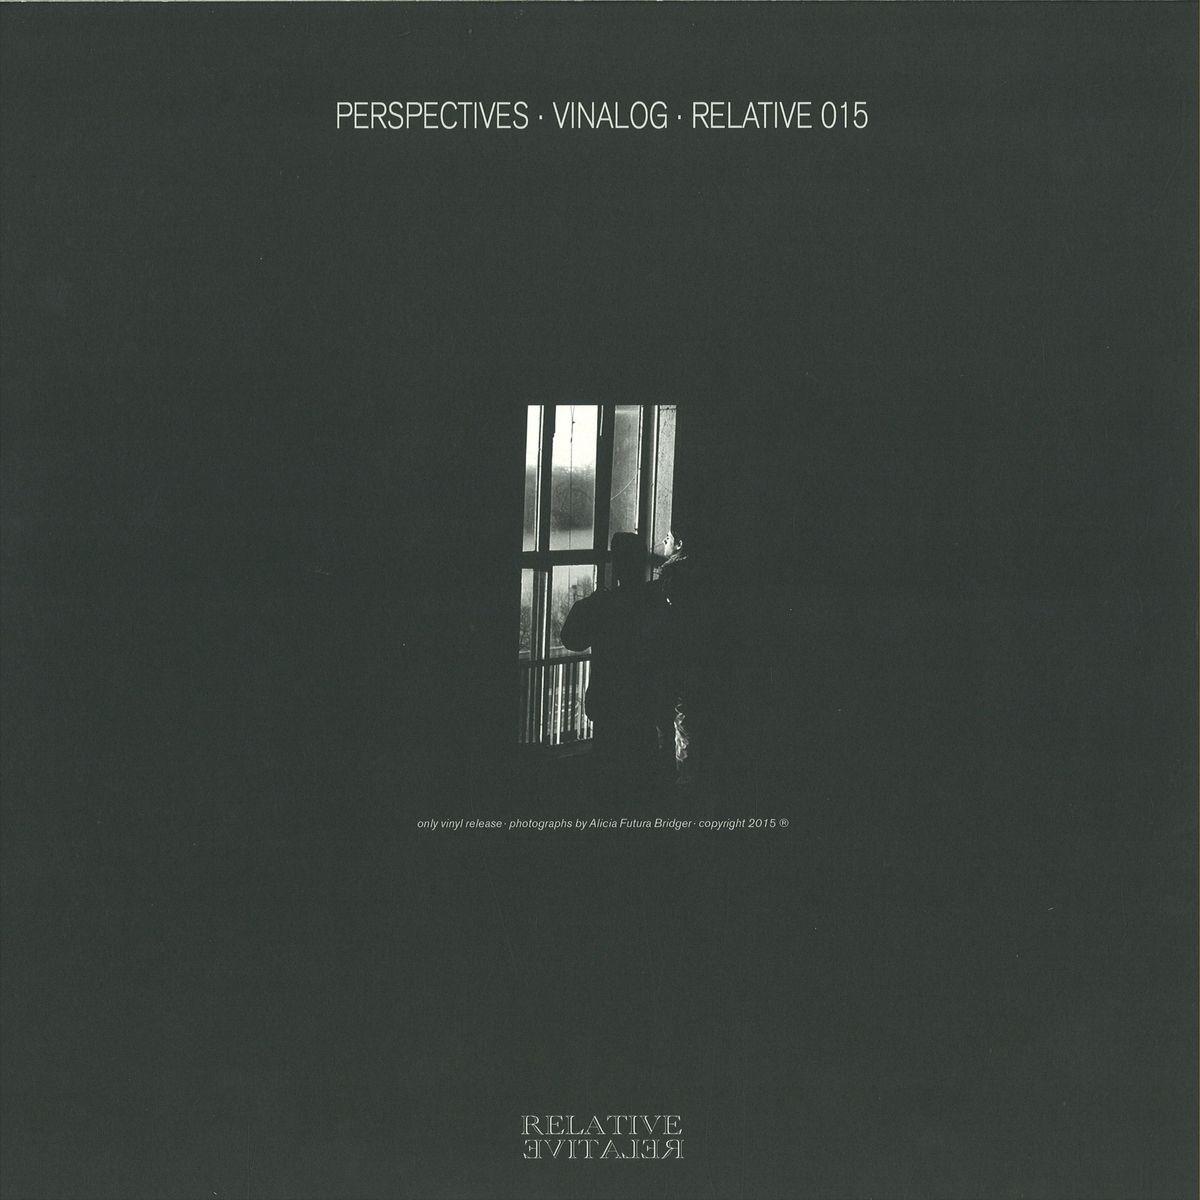 Vinalog - Perspectives [RVT-015]